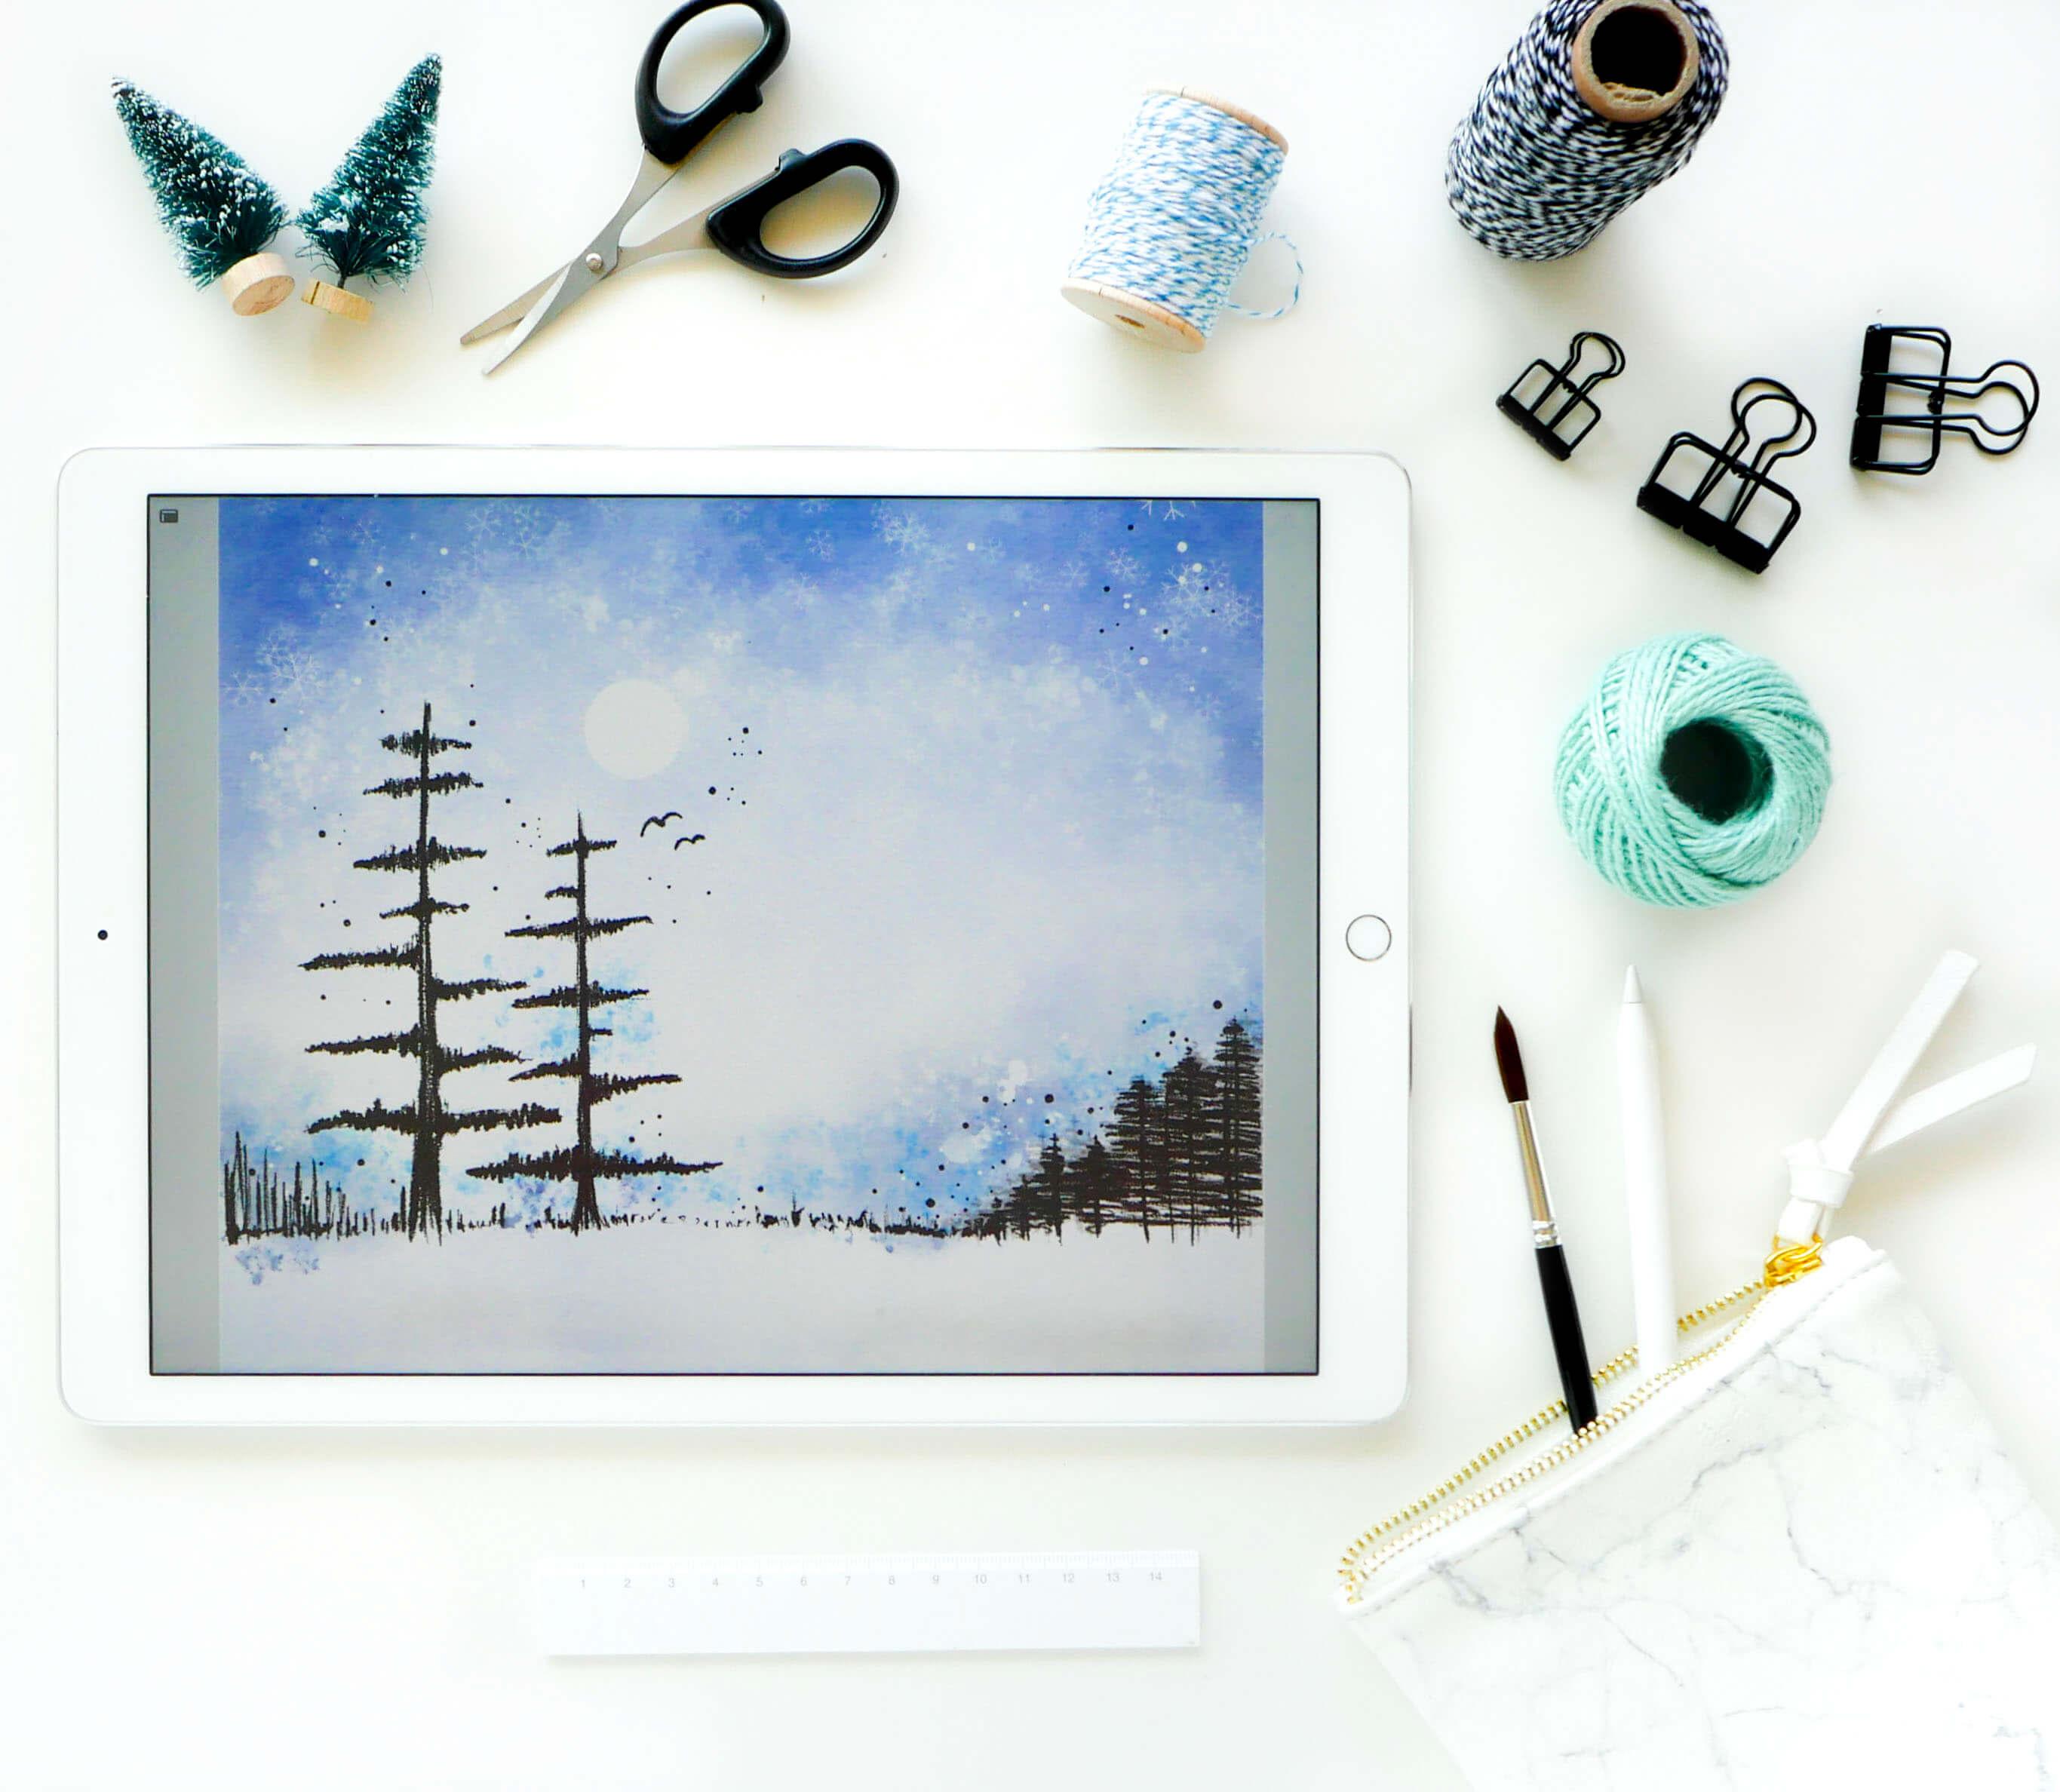 Ipad Watercolor Wonders Online Course